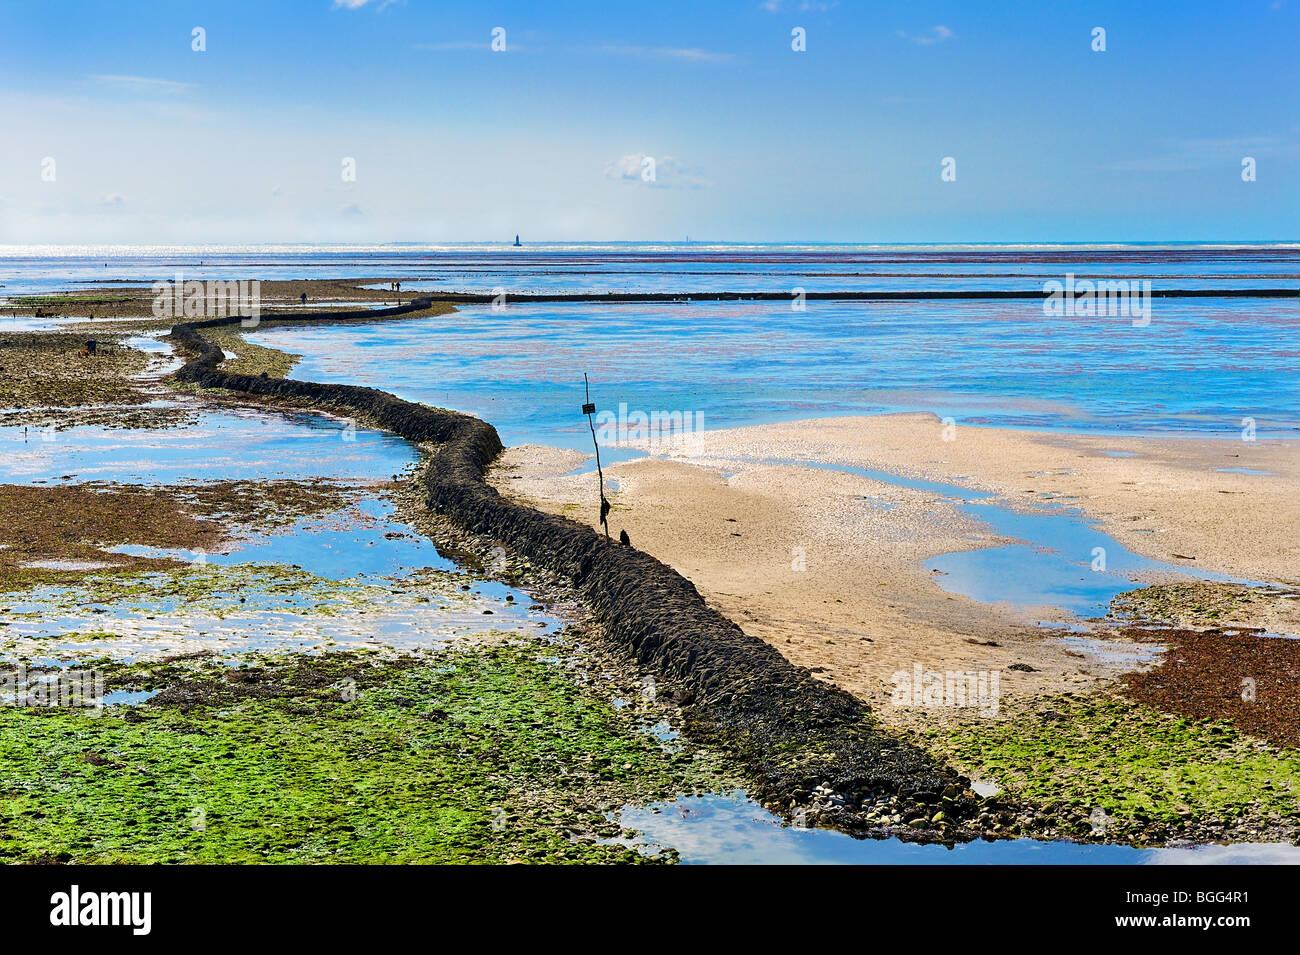 Fishing lock at Ile de Re, France. - Stock Image